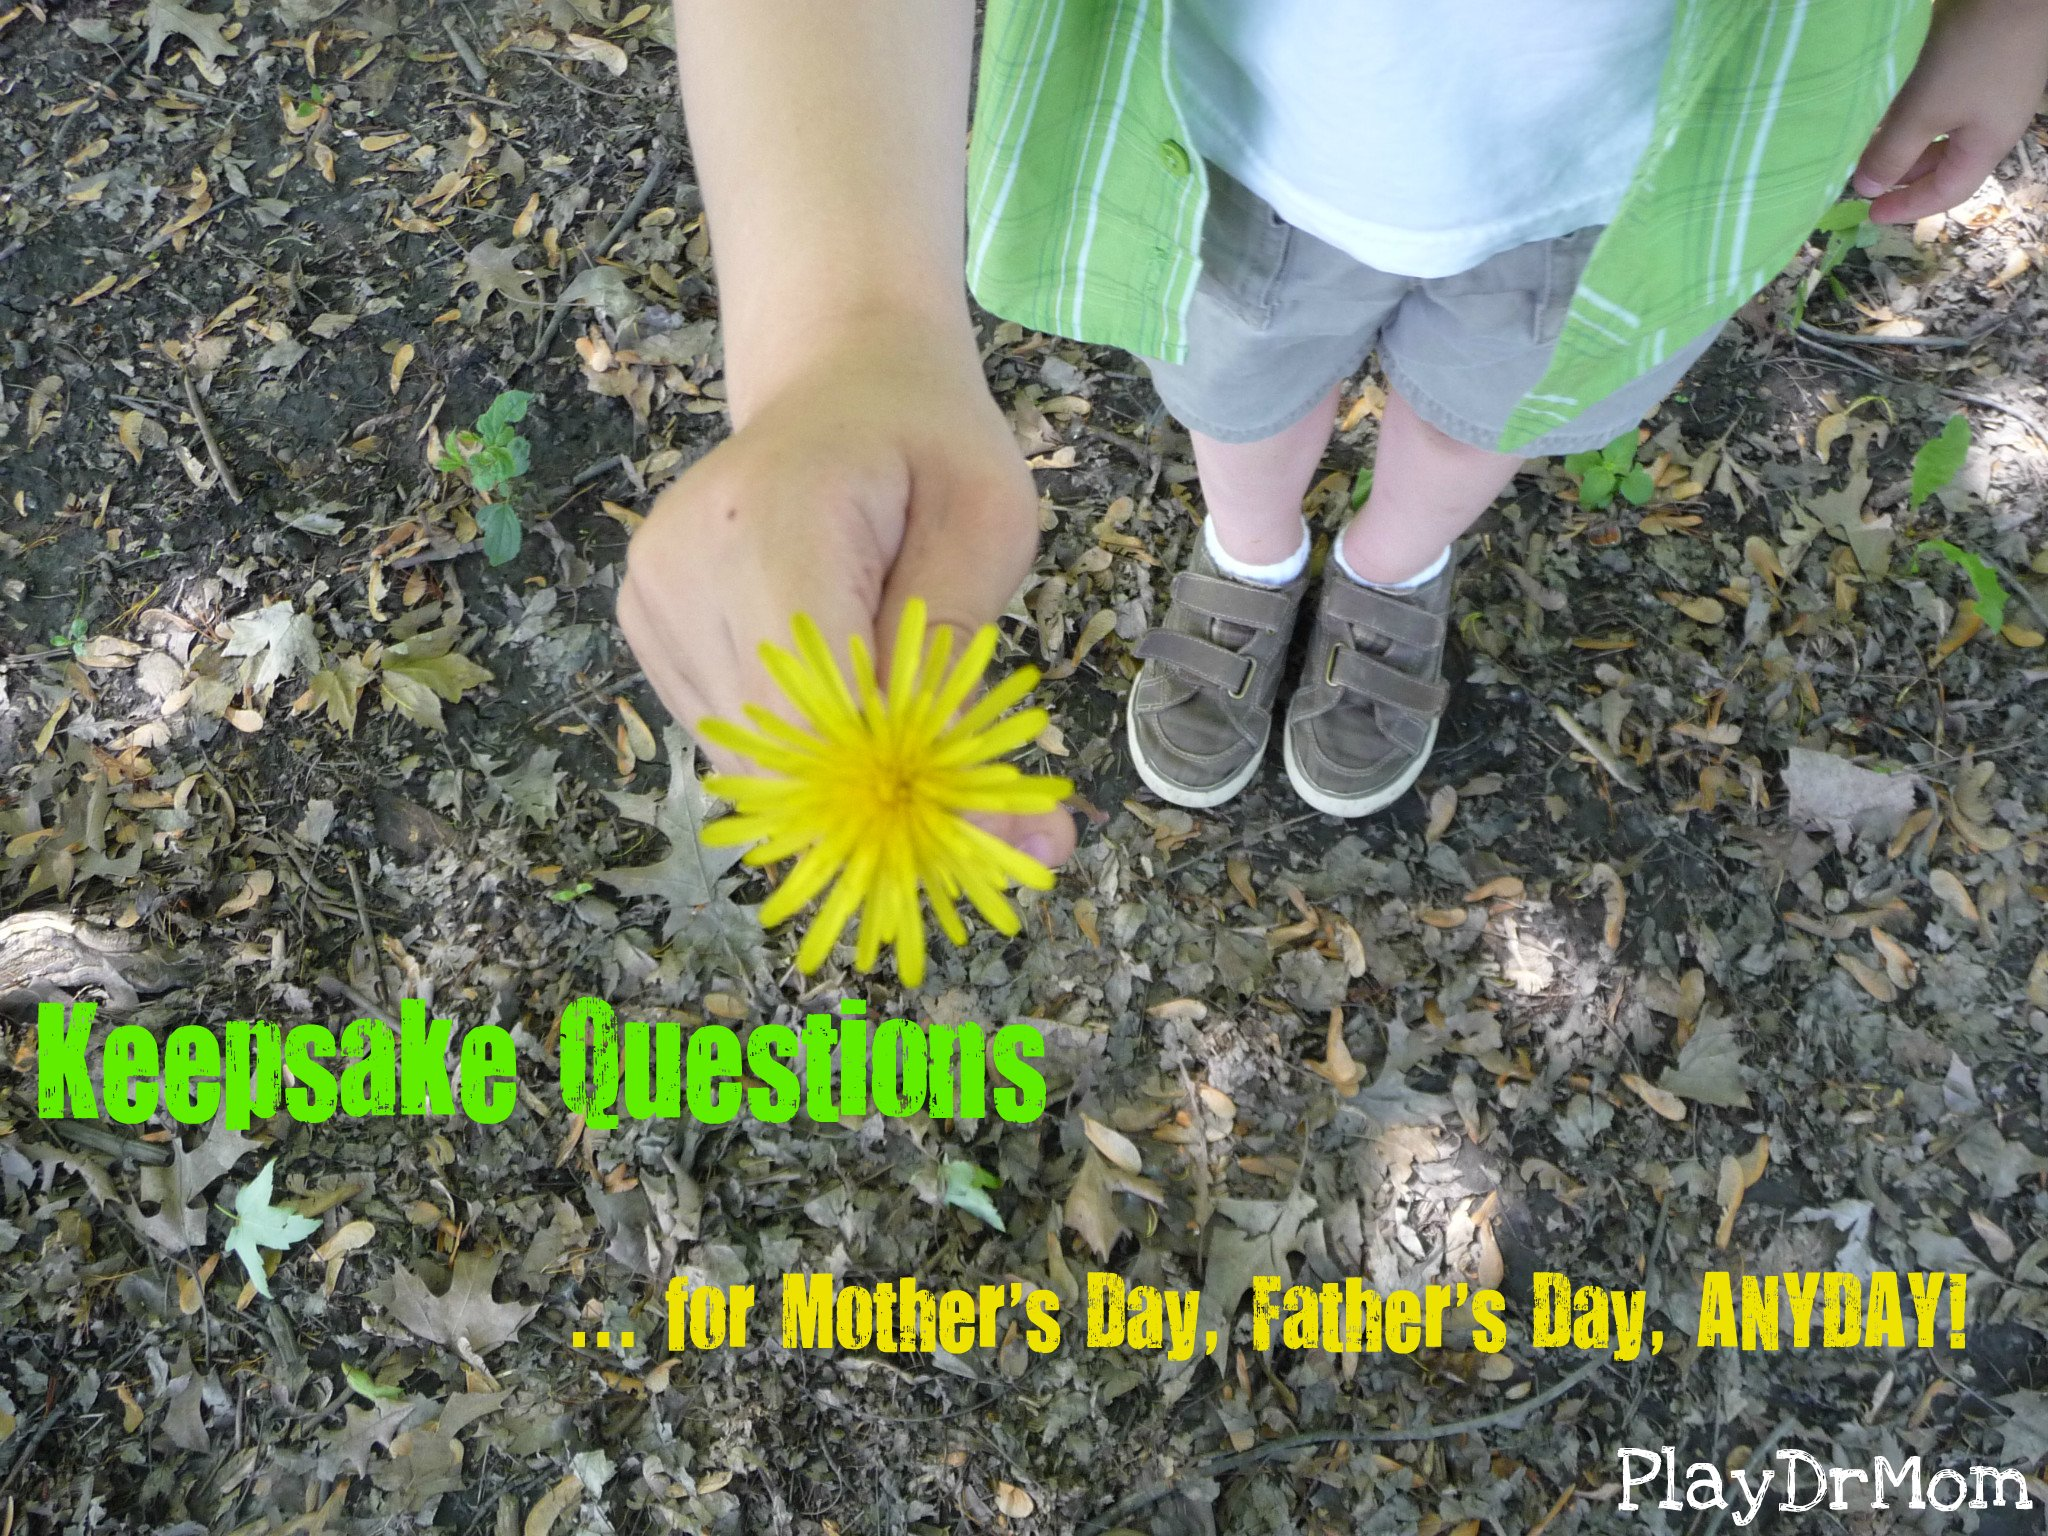 Keepsake Questions